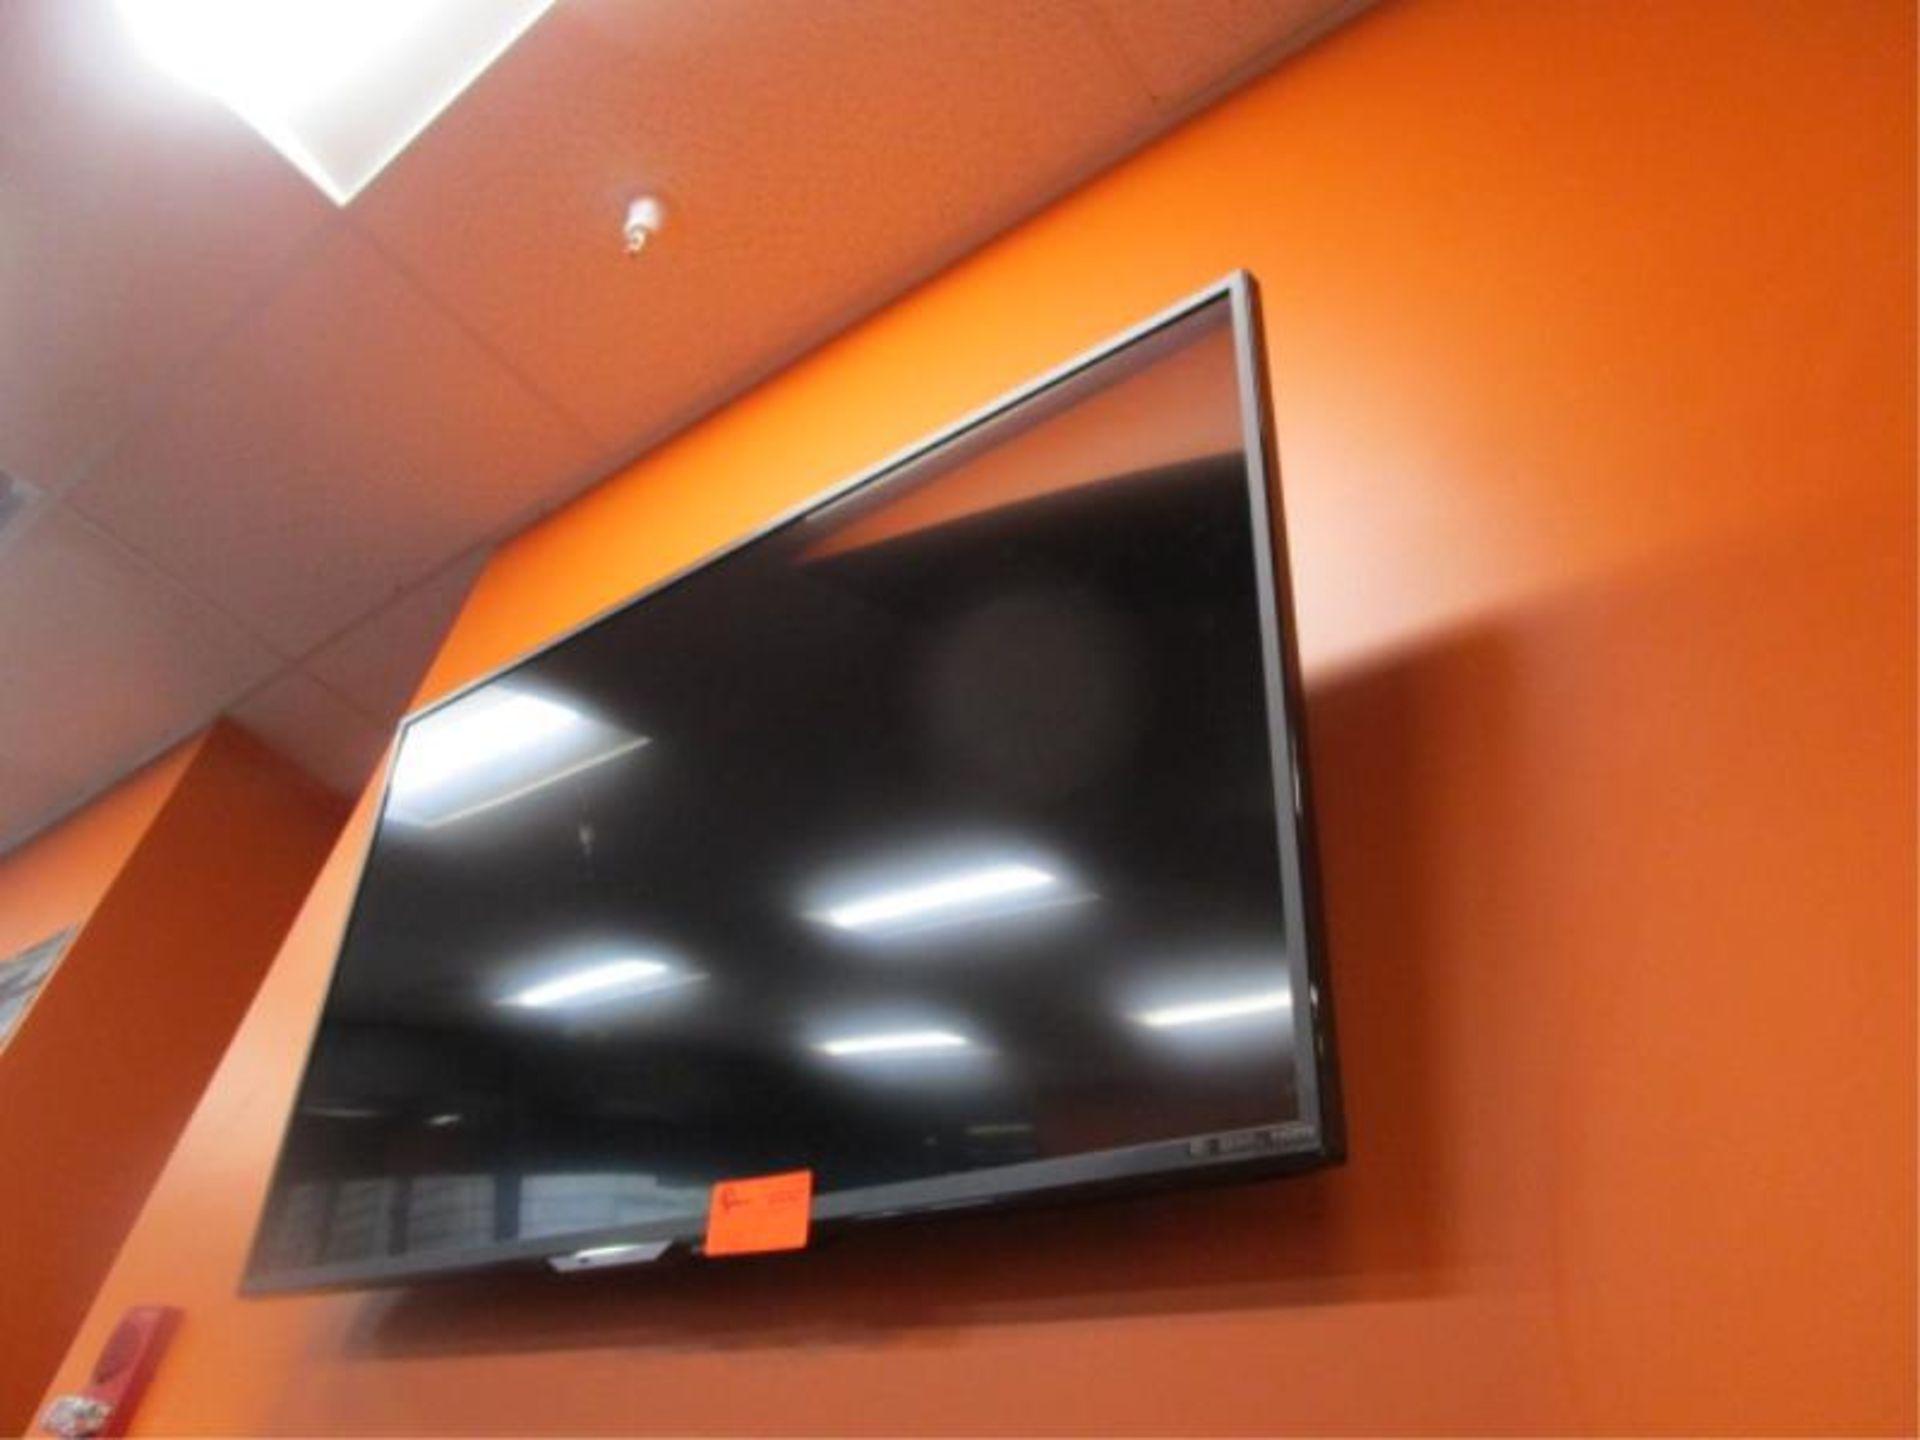 Lot 10 - Sharp Flat Panel TV, Model: LC-55UB3OUB, Liquid Crystal Display